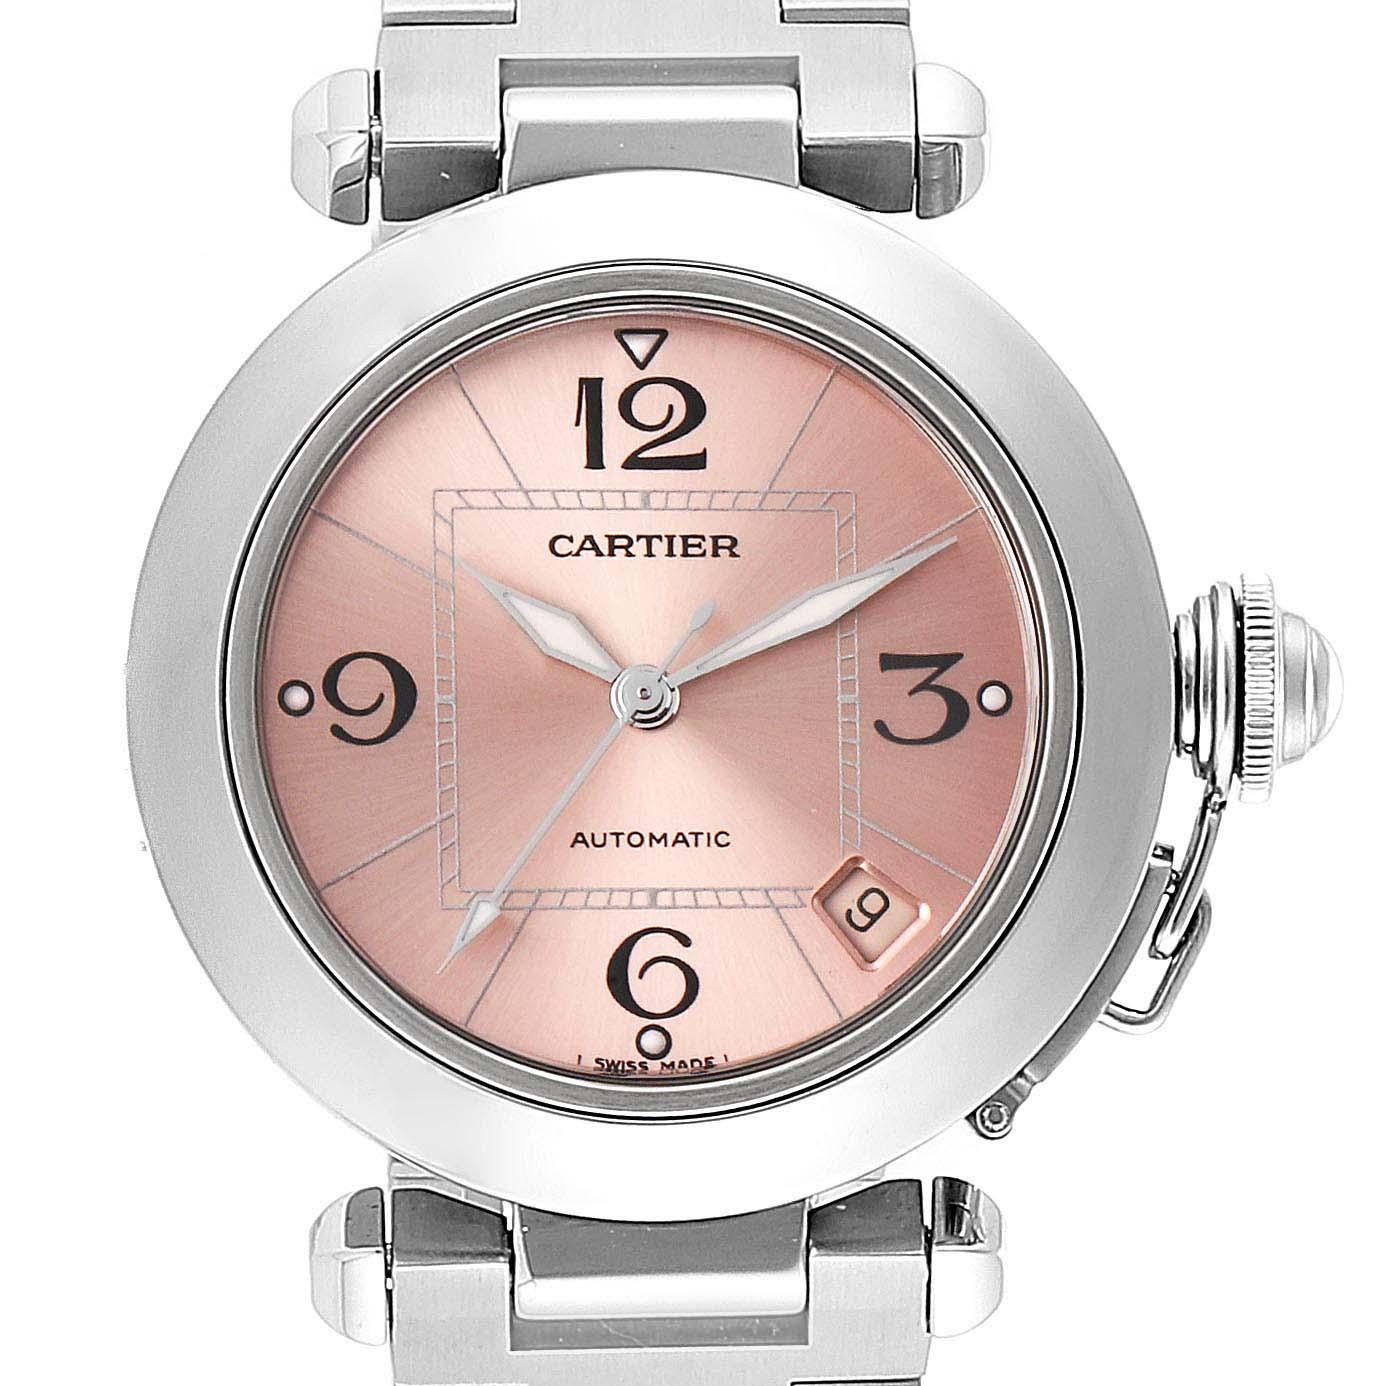 Cartier Pasha C Midsize Pink Dial Automatic Ladies Watch W31075M7 Box